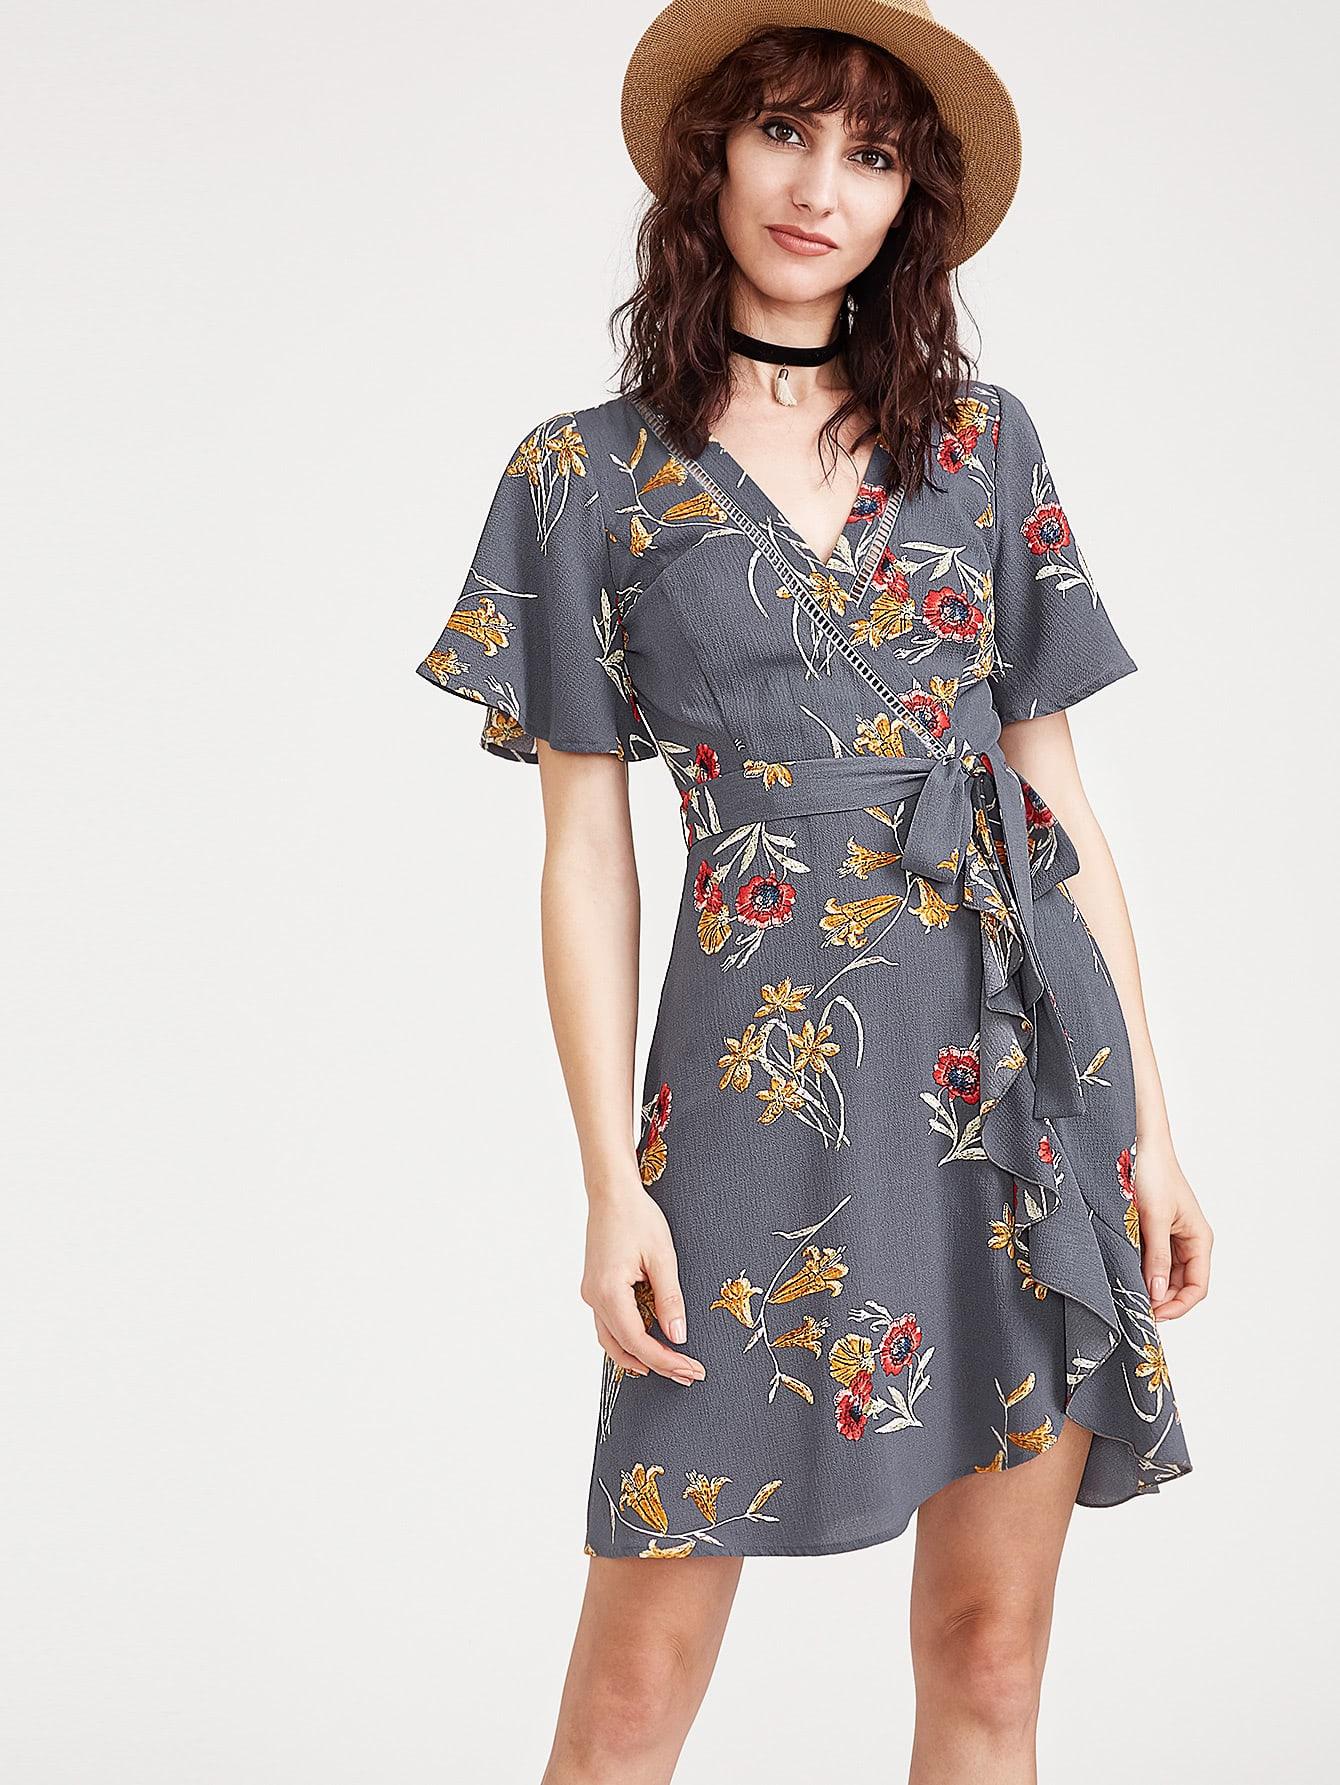 Botanical Print Flutter Sleeve Surplice Obi Tie Dress